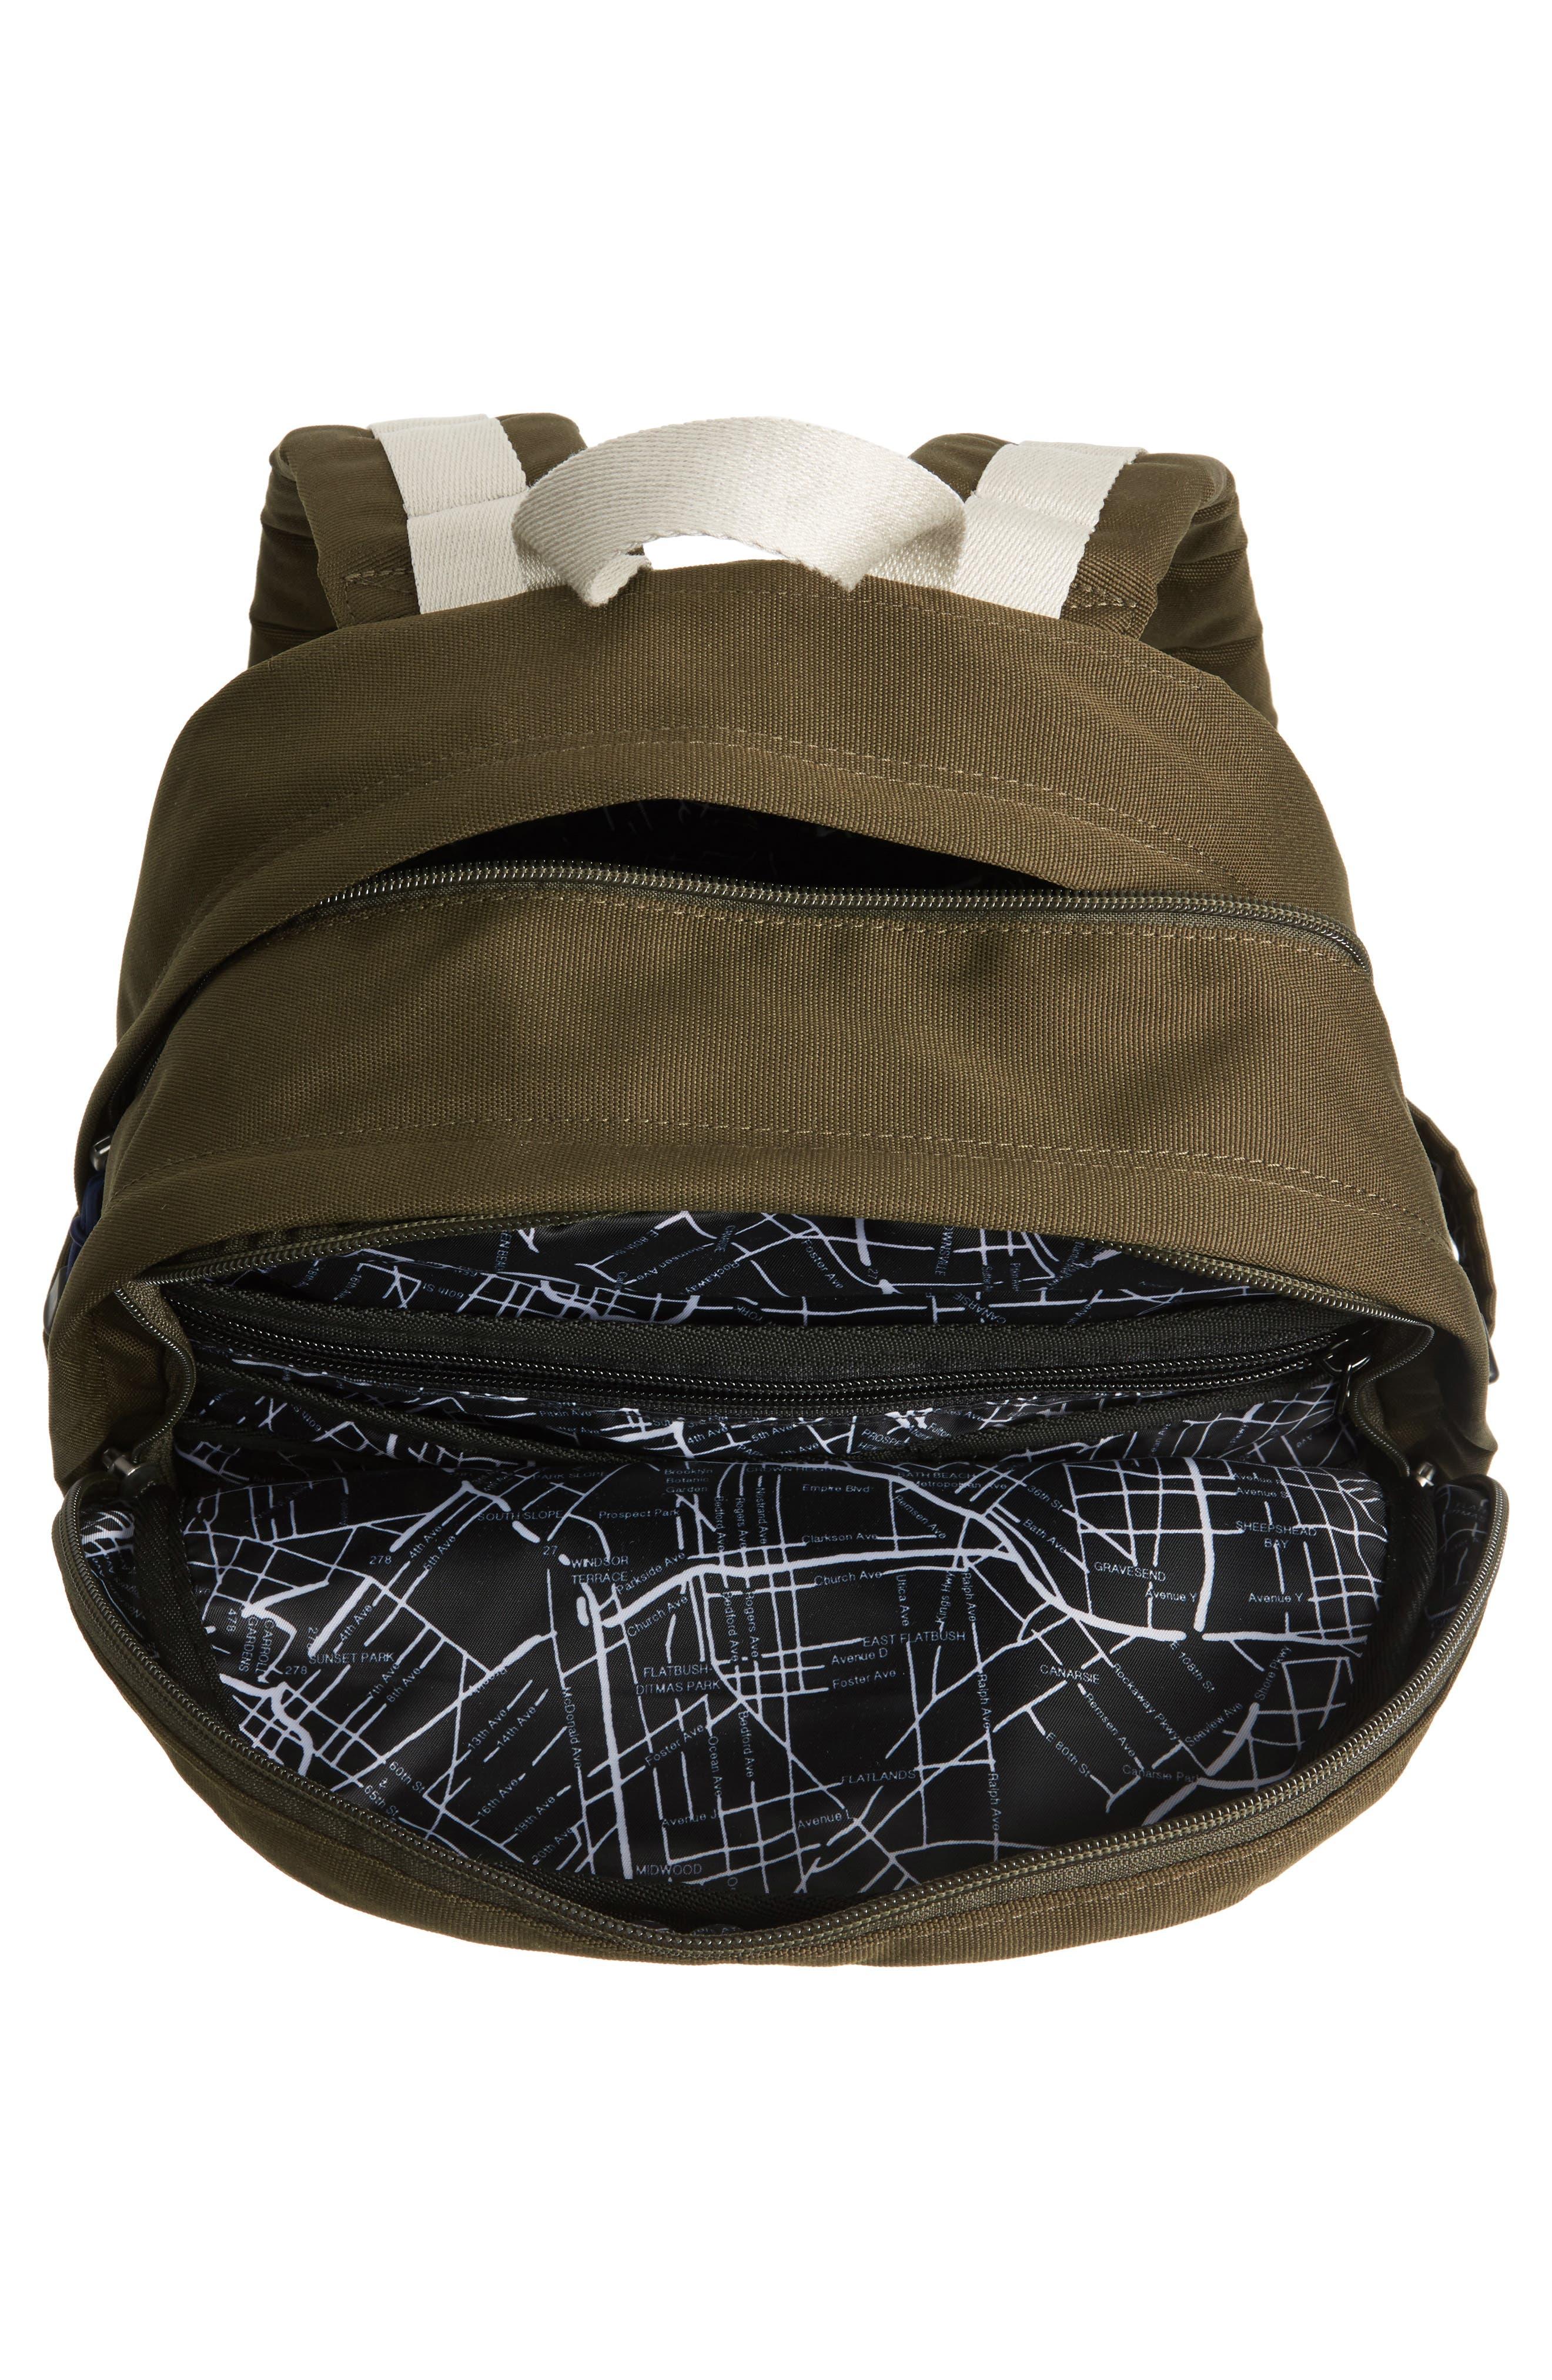 Williamsburg Bedford Backpack,                             Alternate thumbnail 11, color,